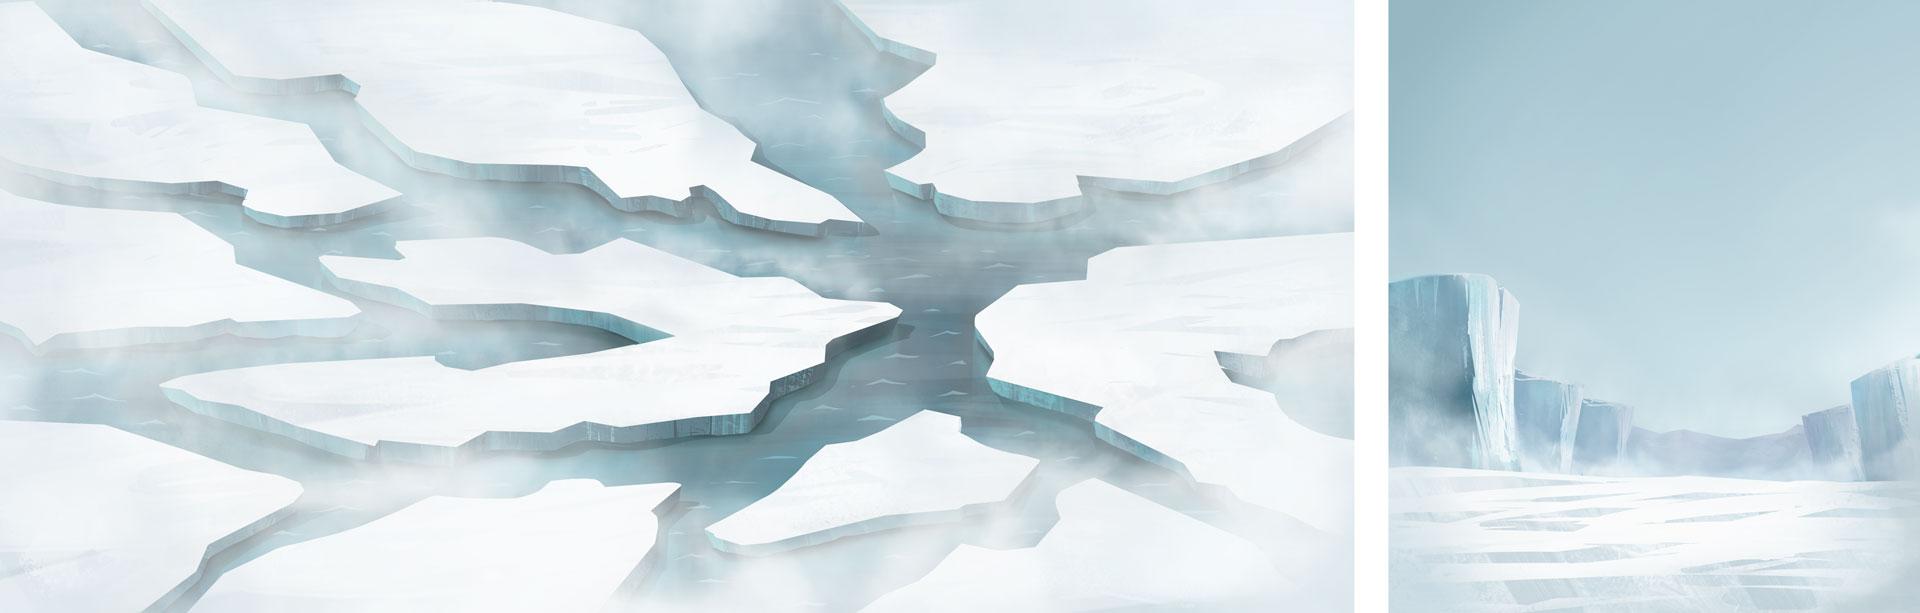 Ice floe north pole illustration for Pigeon Studio by Jakub Cichecki